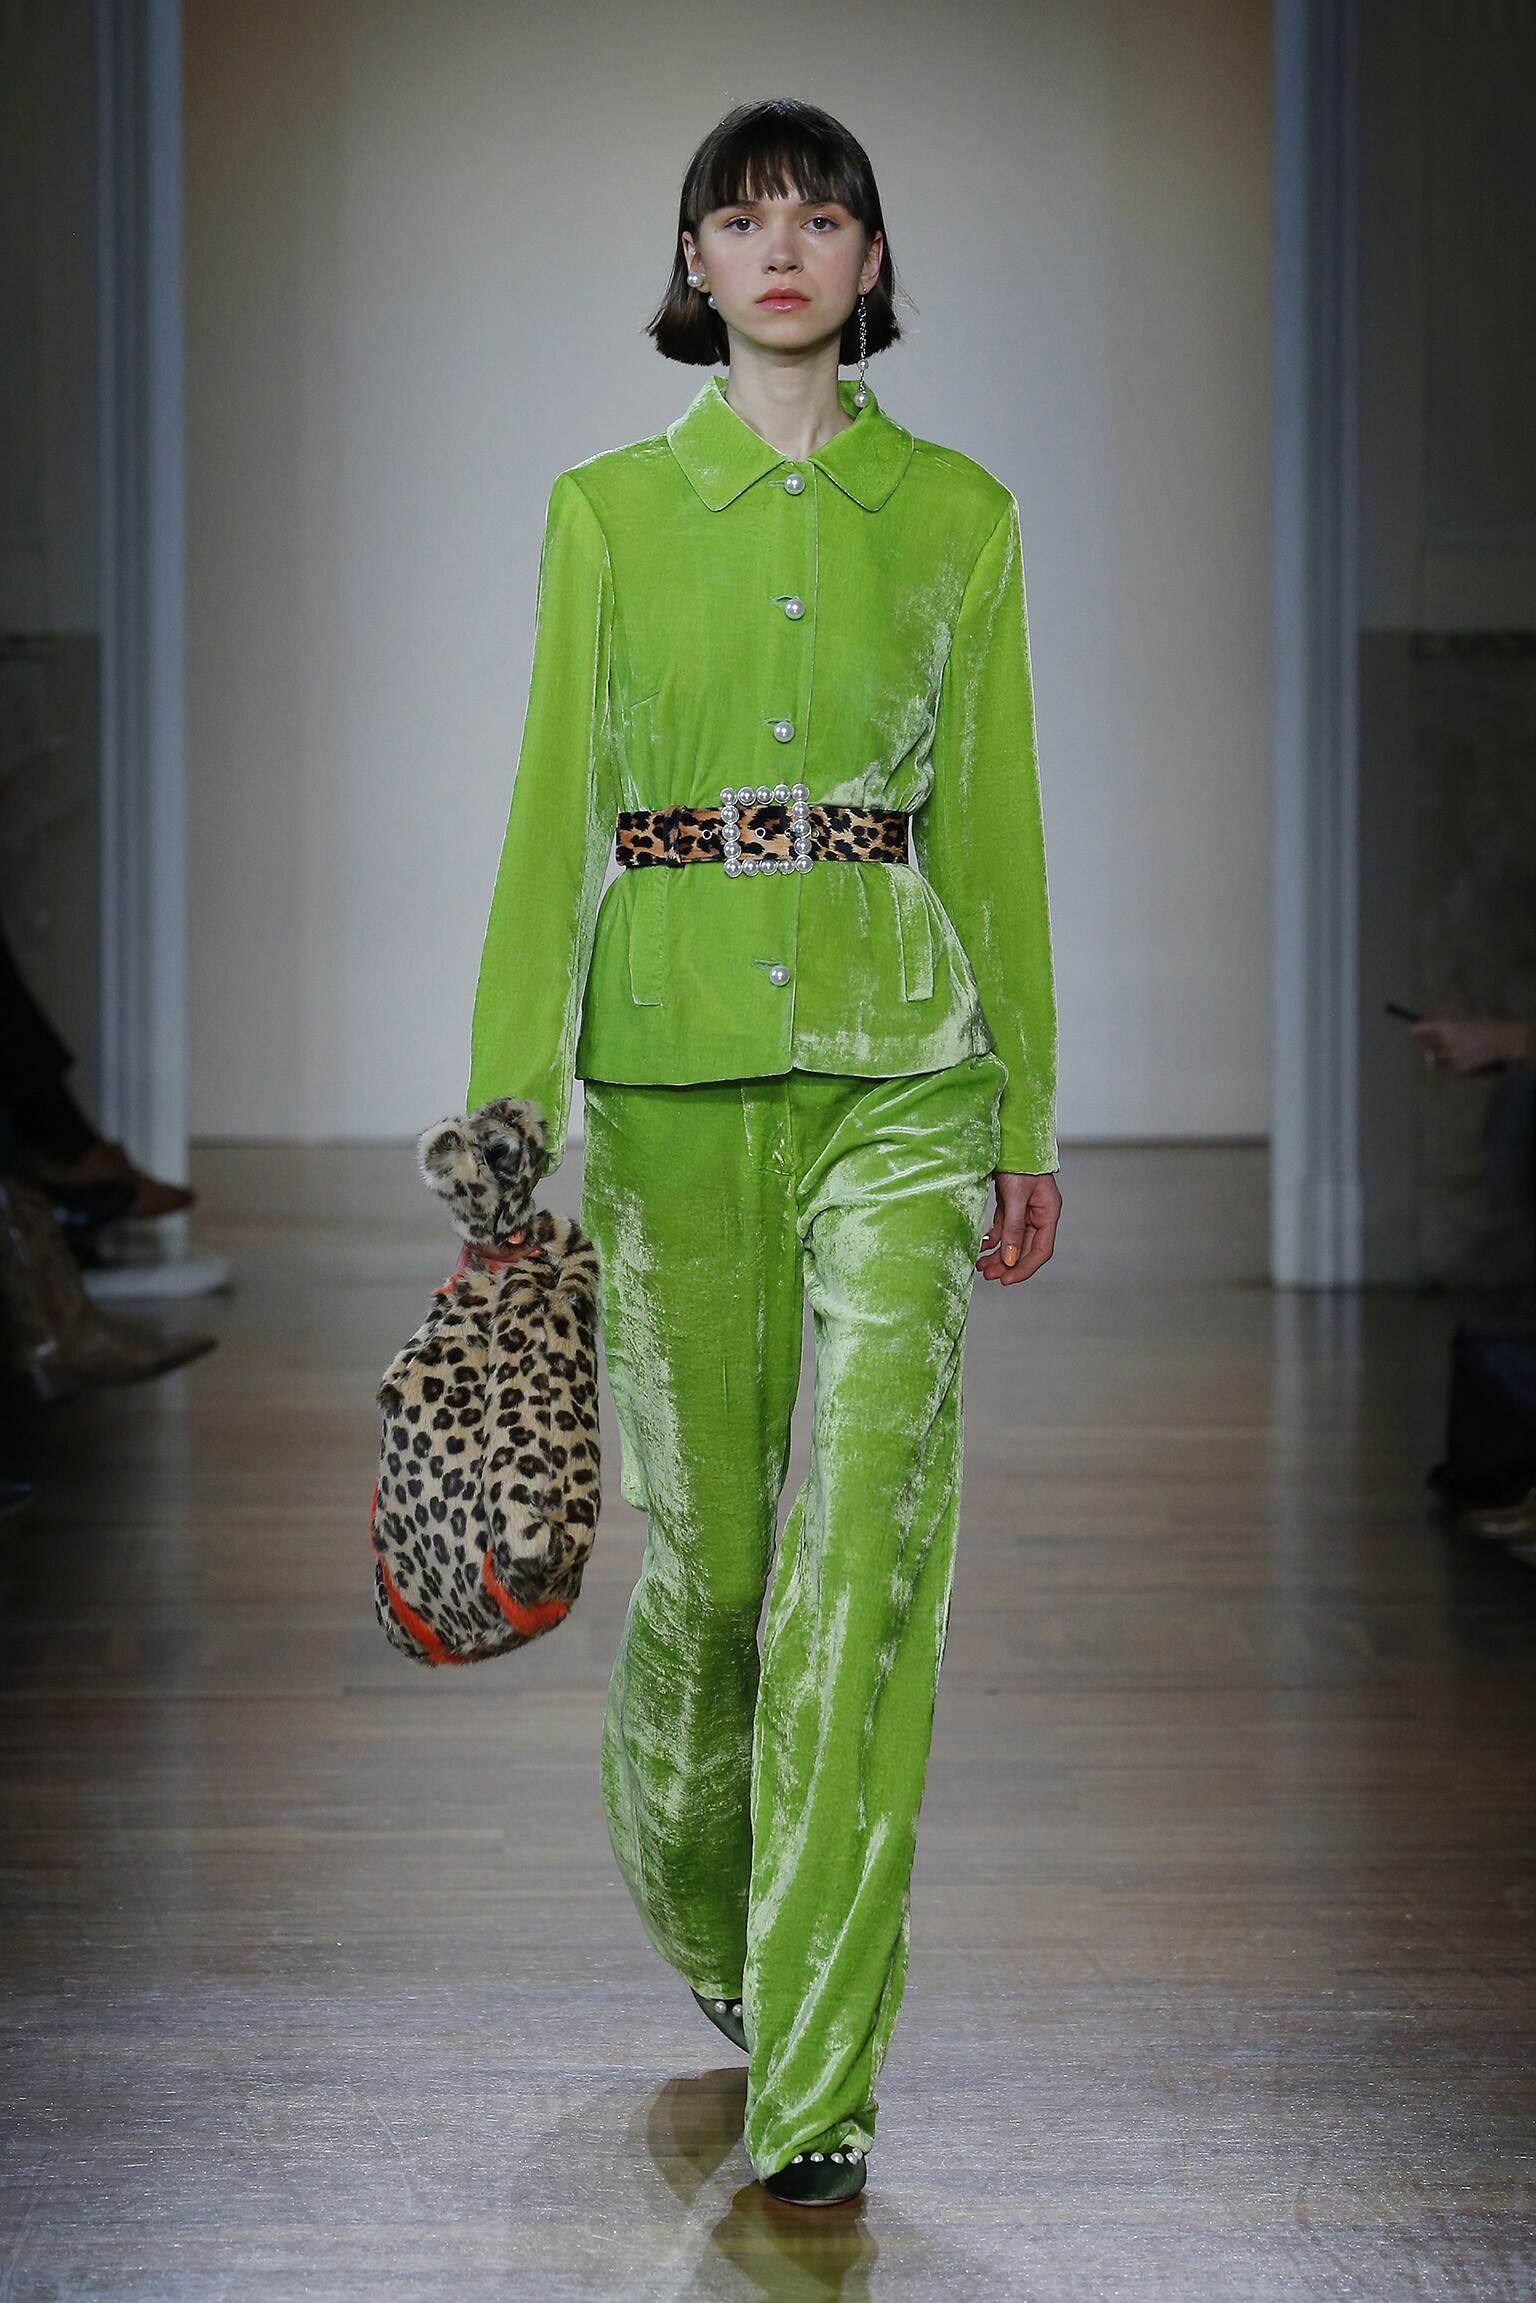 Fashion Woman Model Blugirl Catwalk 17-18